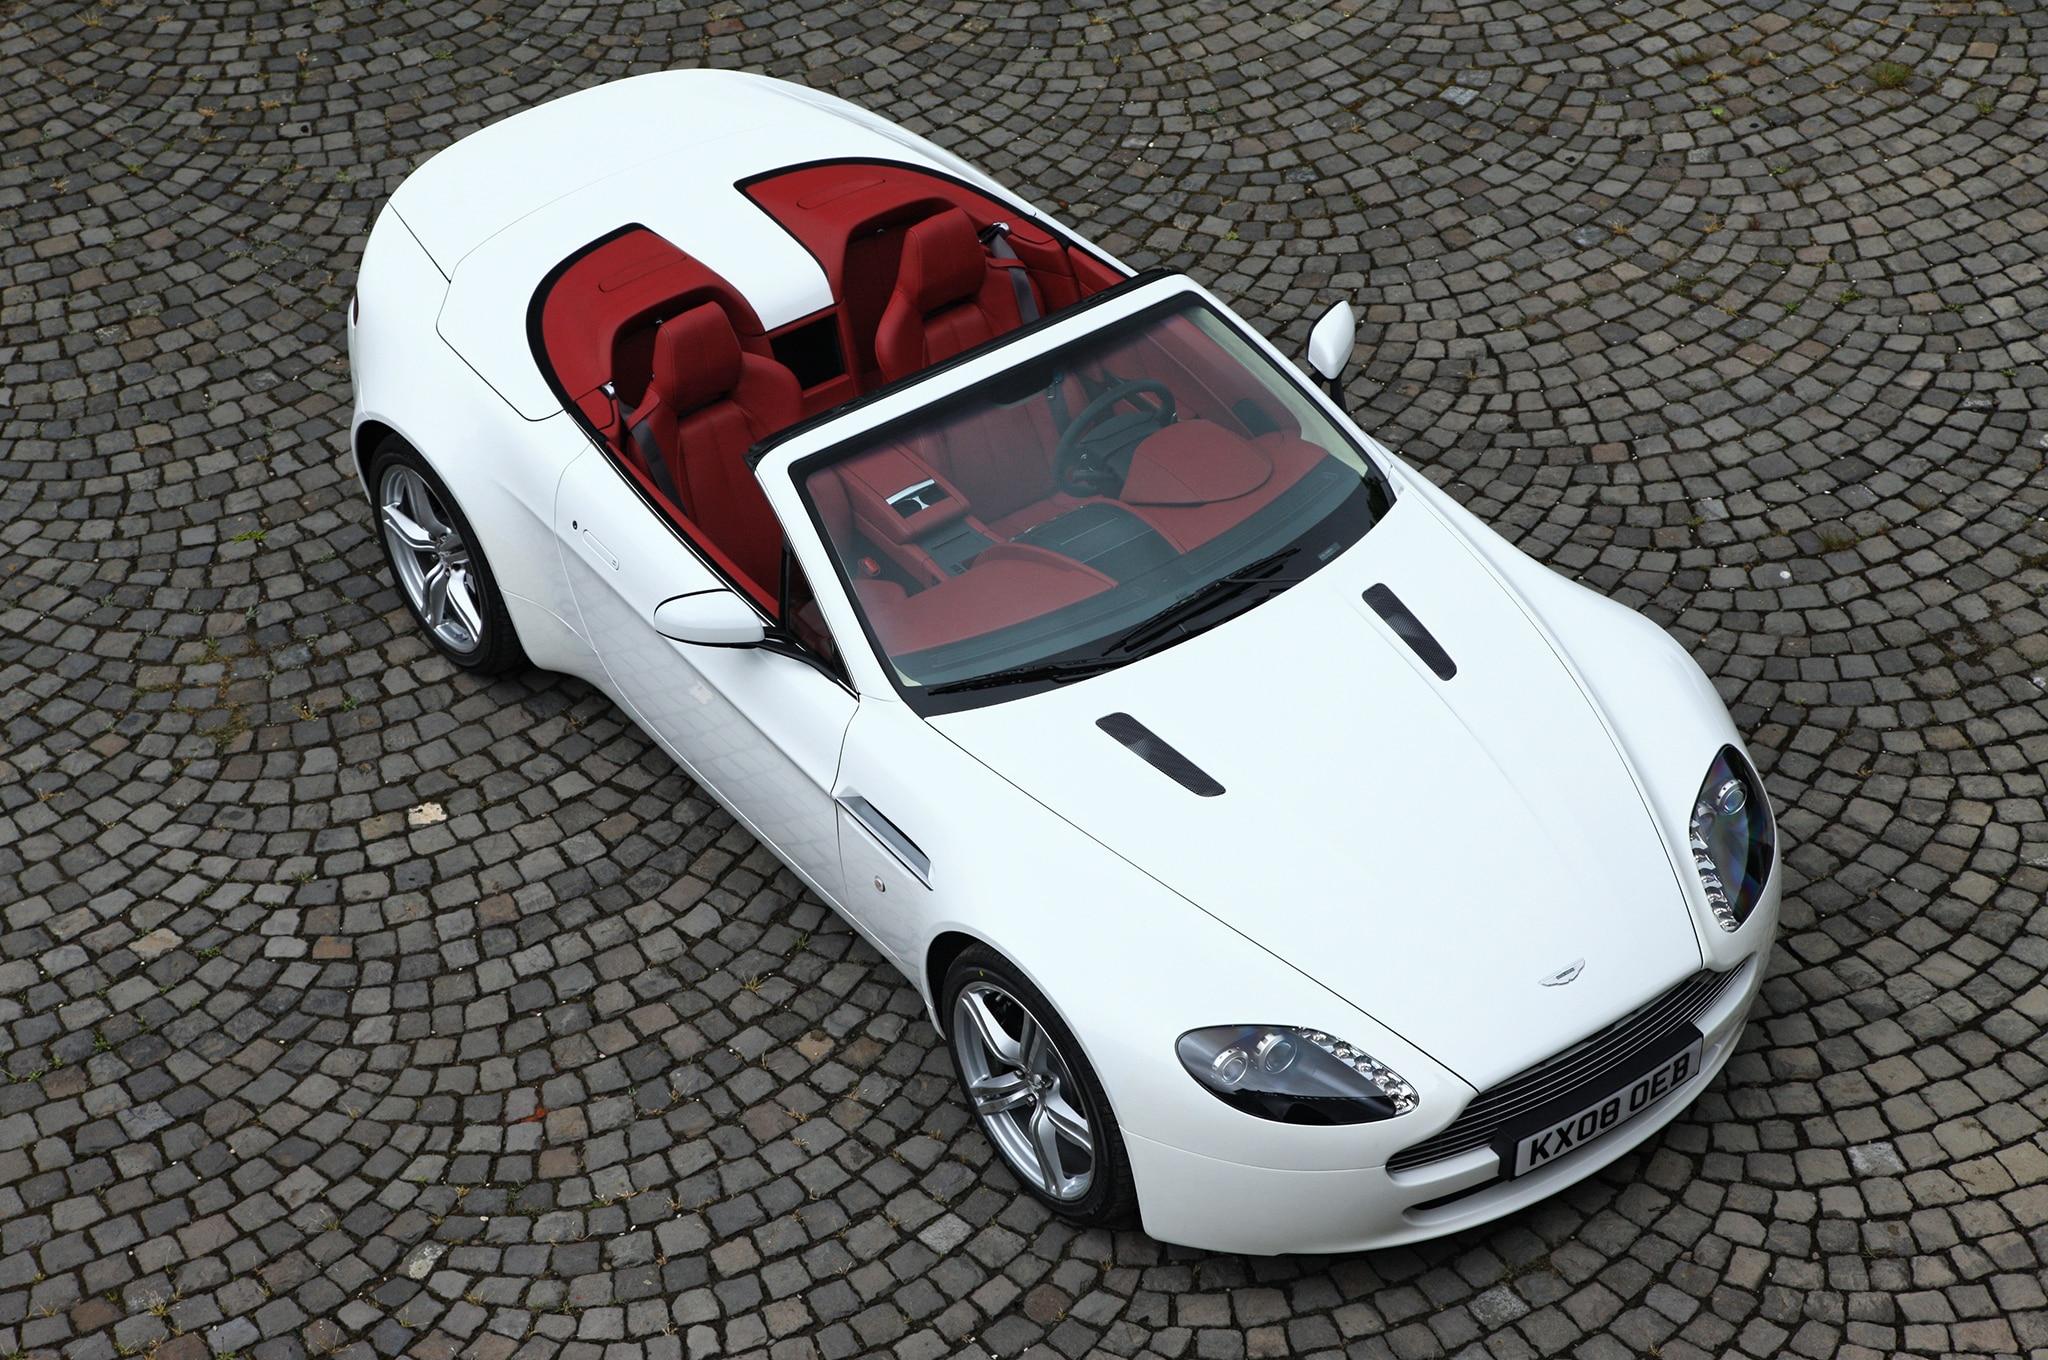 aston martin debuts v8 vantage n430, db9 carbon special editions